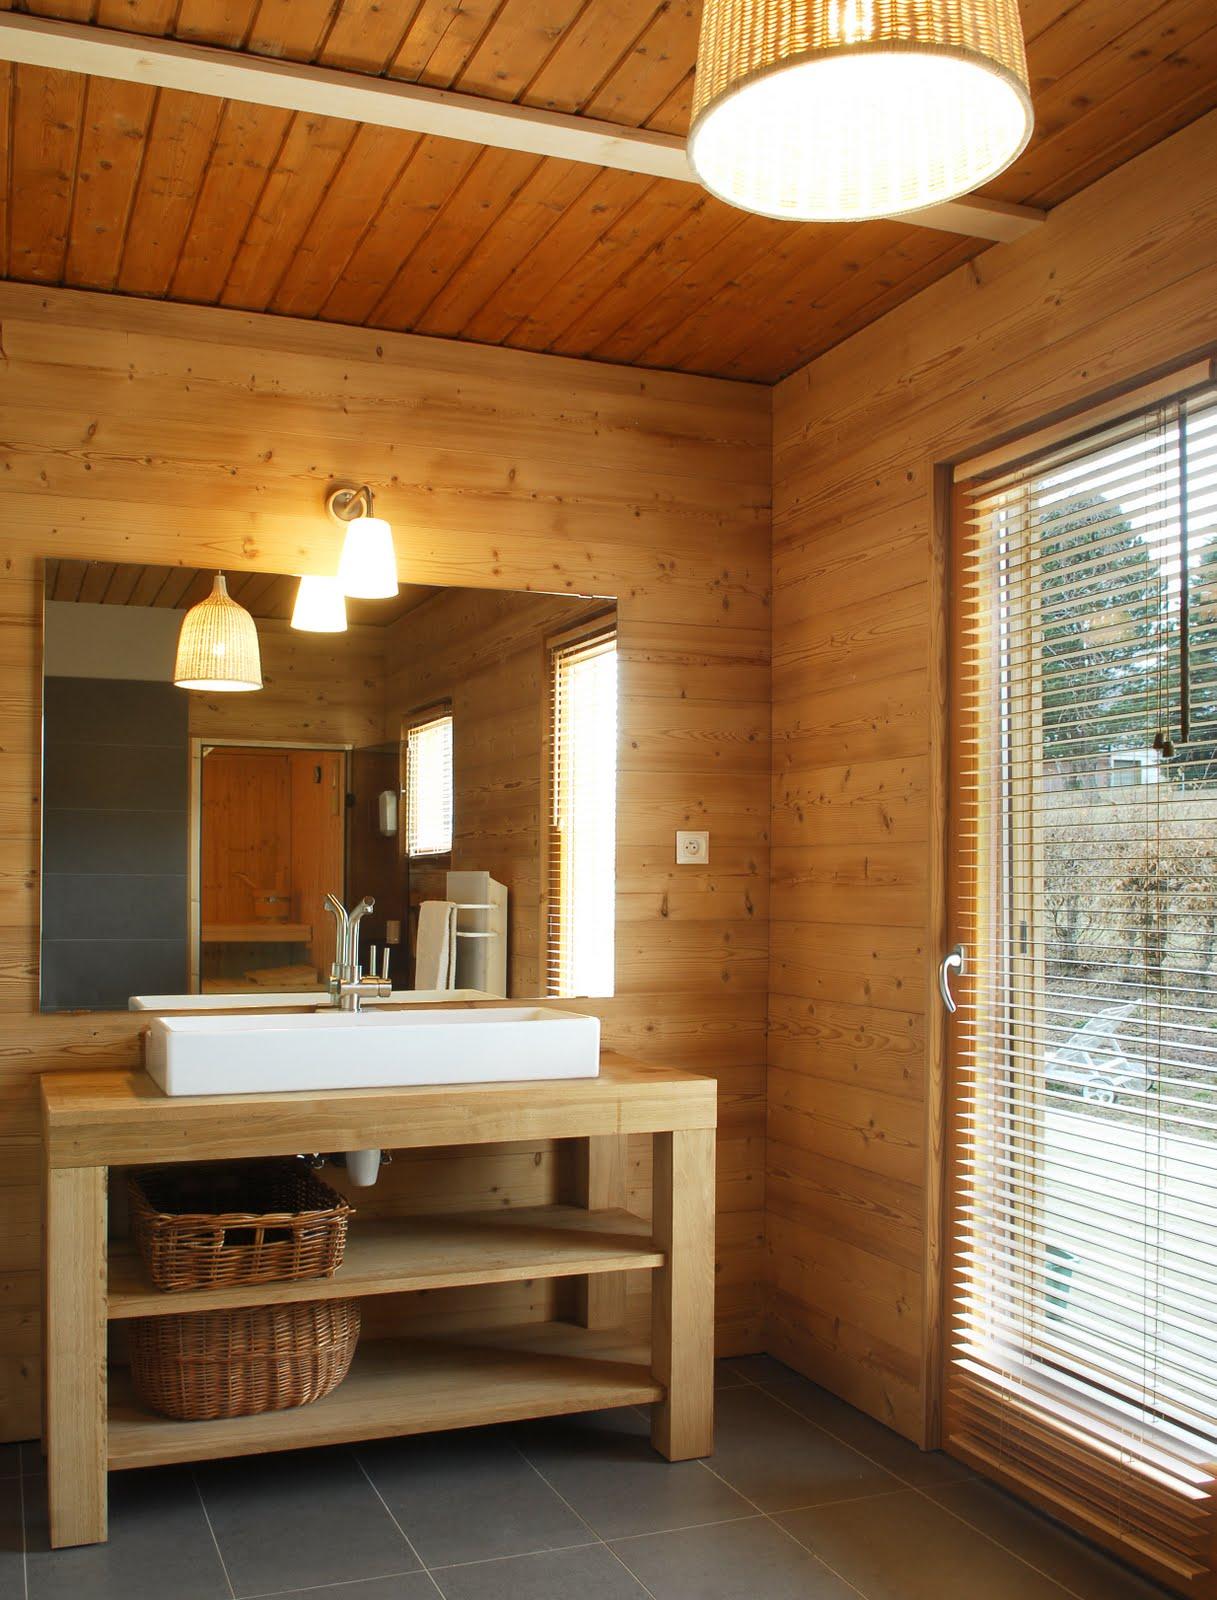 salle de bain sauna gallery of salles de bain zen photo gallery with salle de bain sauna great. Black Bedroom Furniture Sets. Home Design Ideas